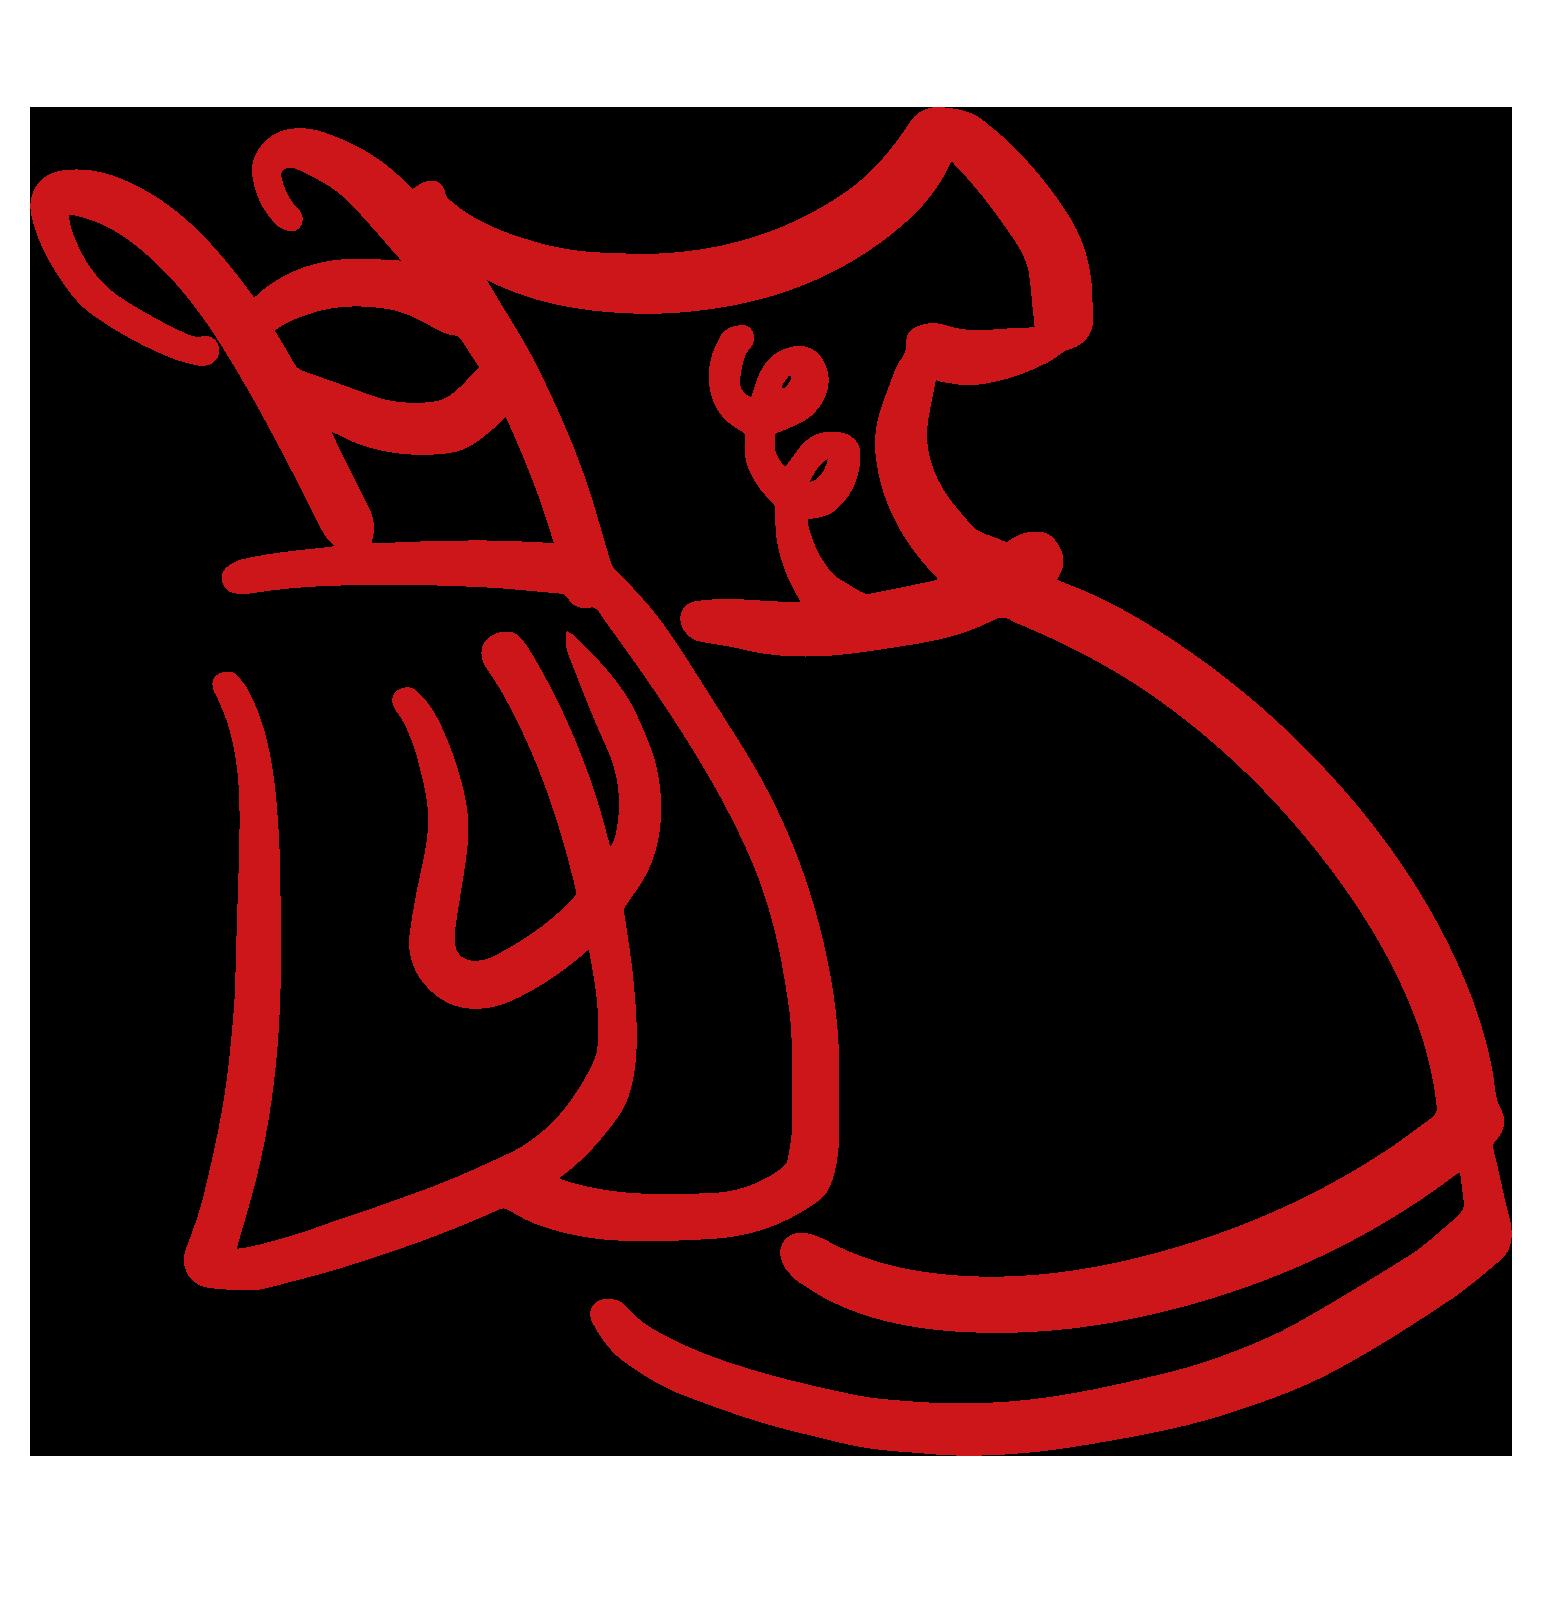 Kurzer Trachtenrock im Petticoat Stil, blassgrün